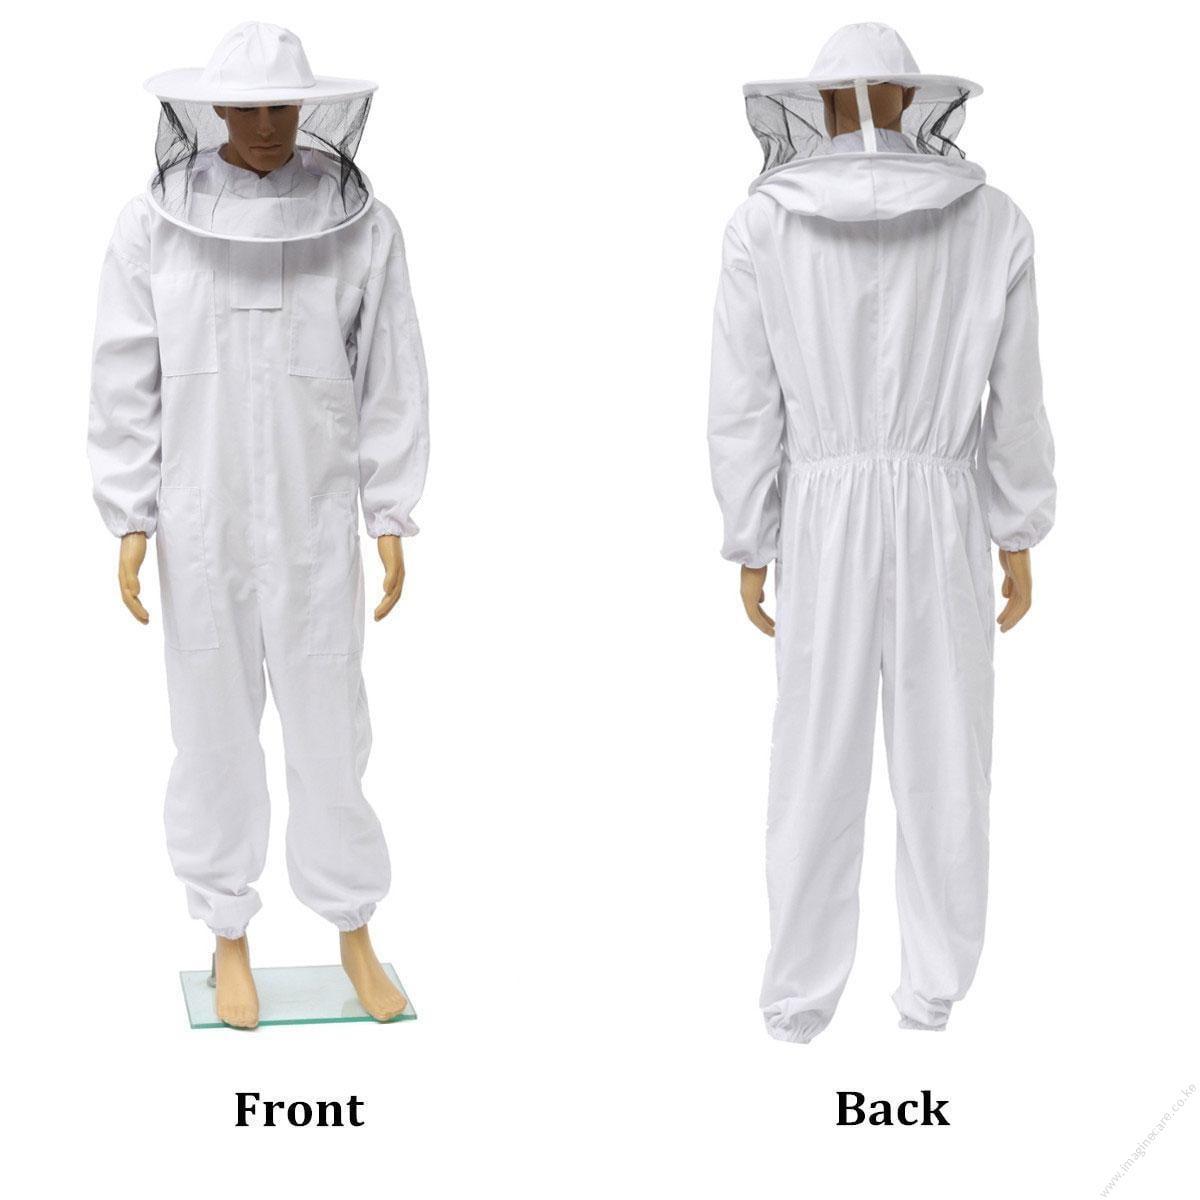 buy bee suit in nairobi